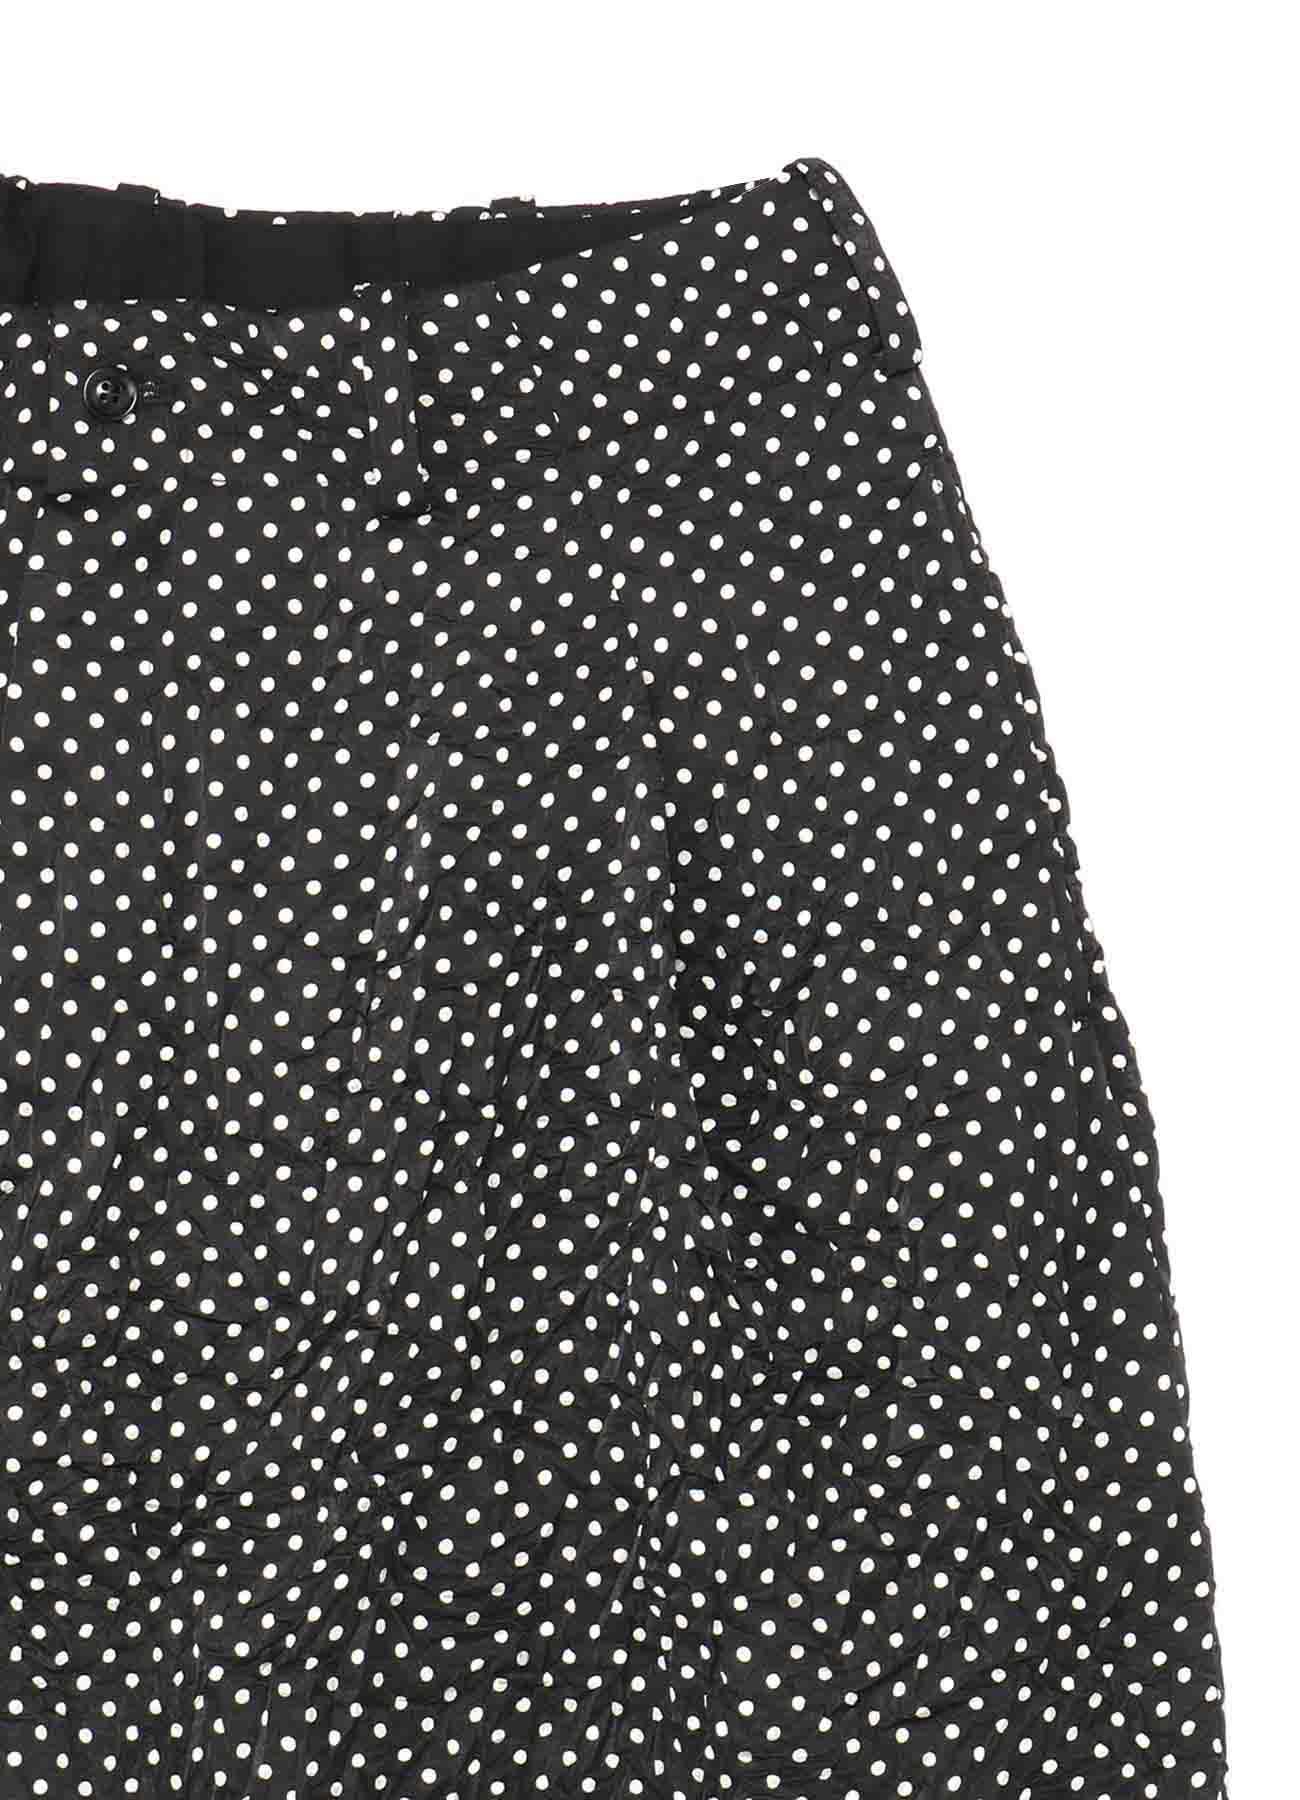 Pe/Dot Wrinkles One Tack 6-quarter-length Pants